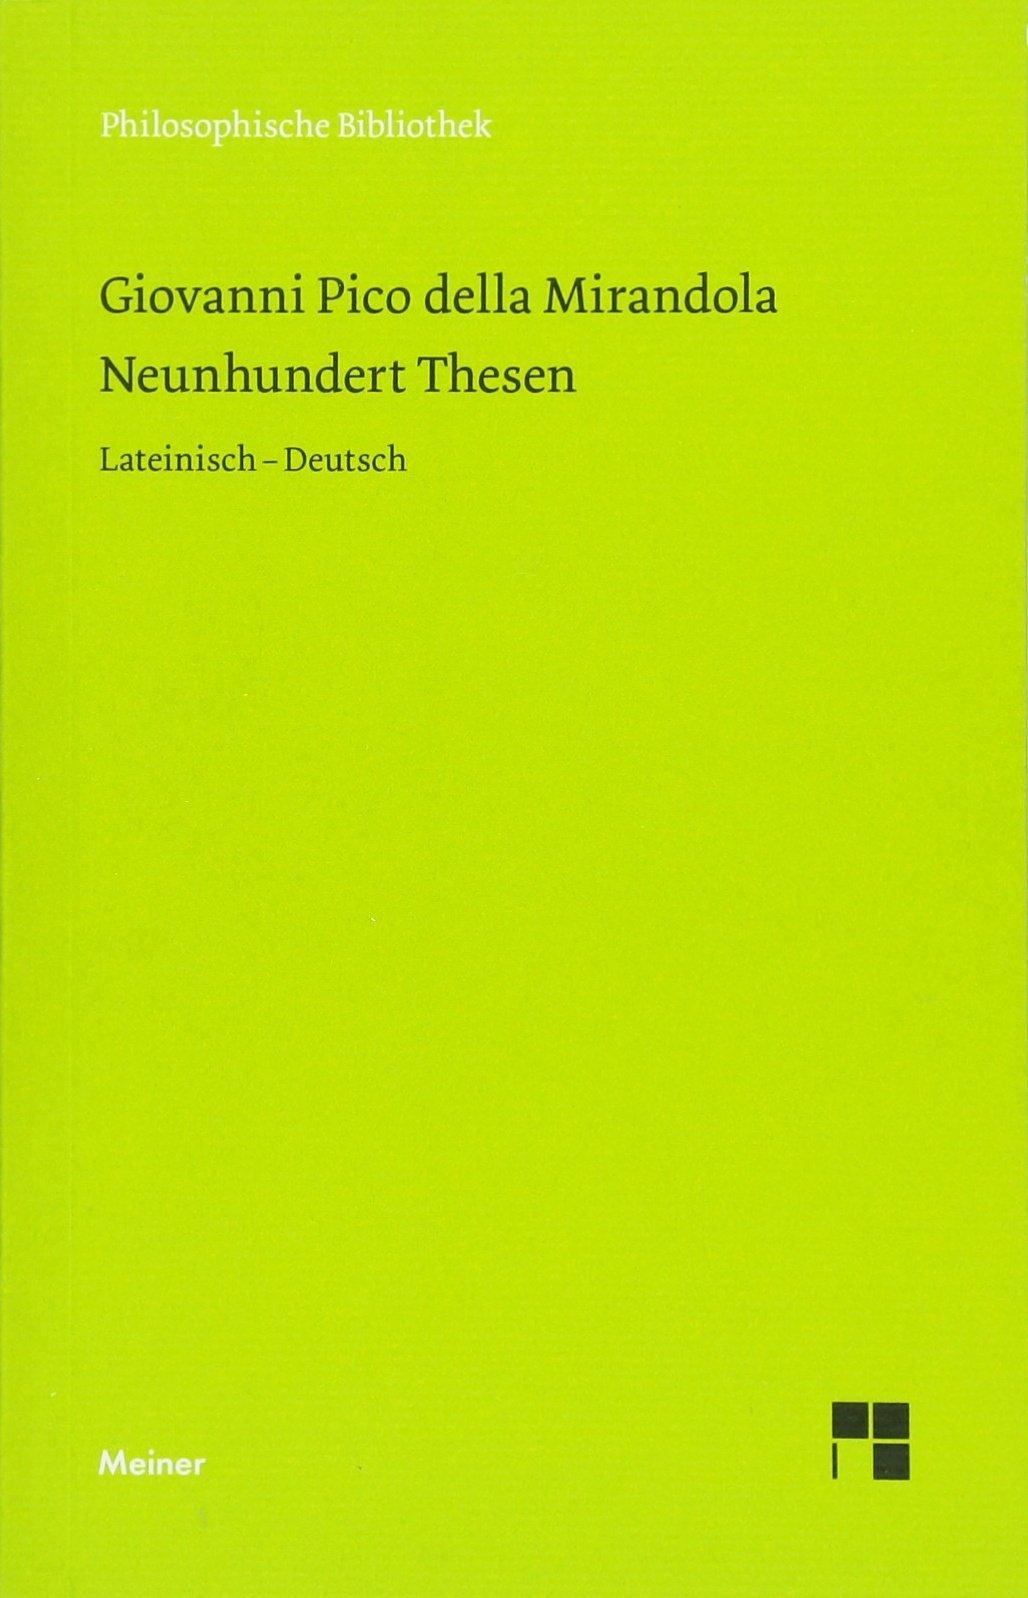 Neunhundert Thesen (Philosophische Bibliothek)